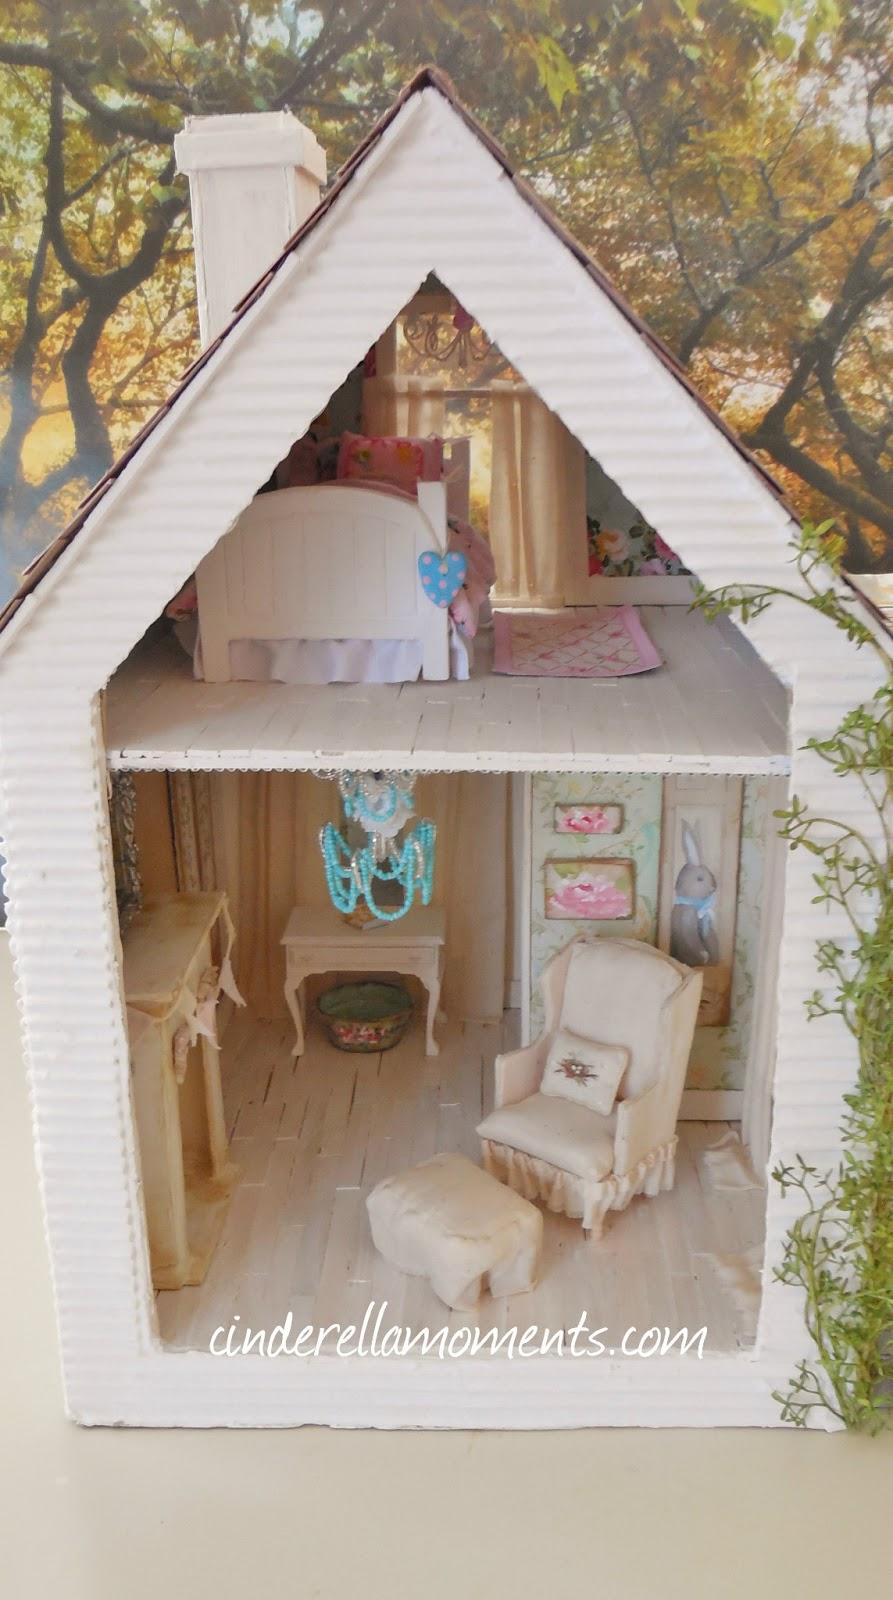 Cinderella Moments Baleine Beach Cottage Dollhouse Finished